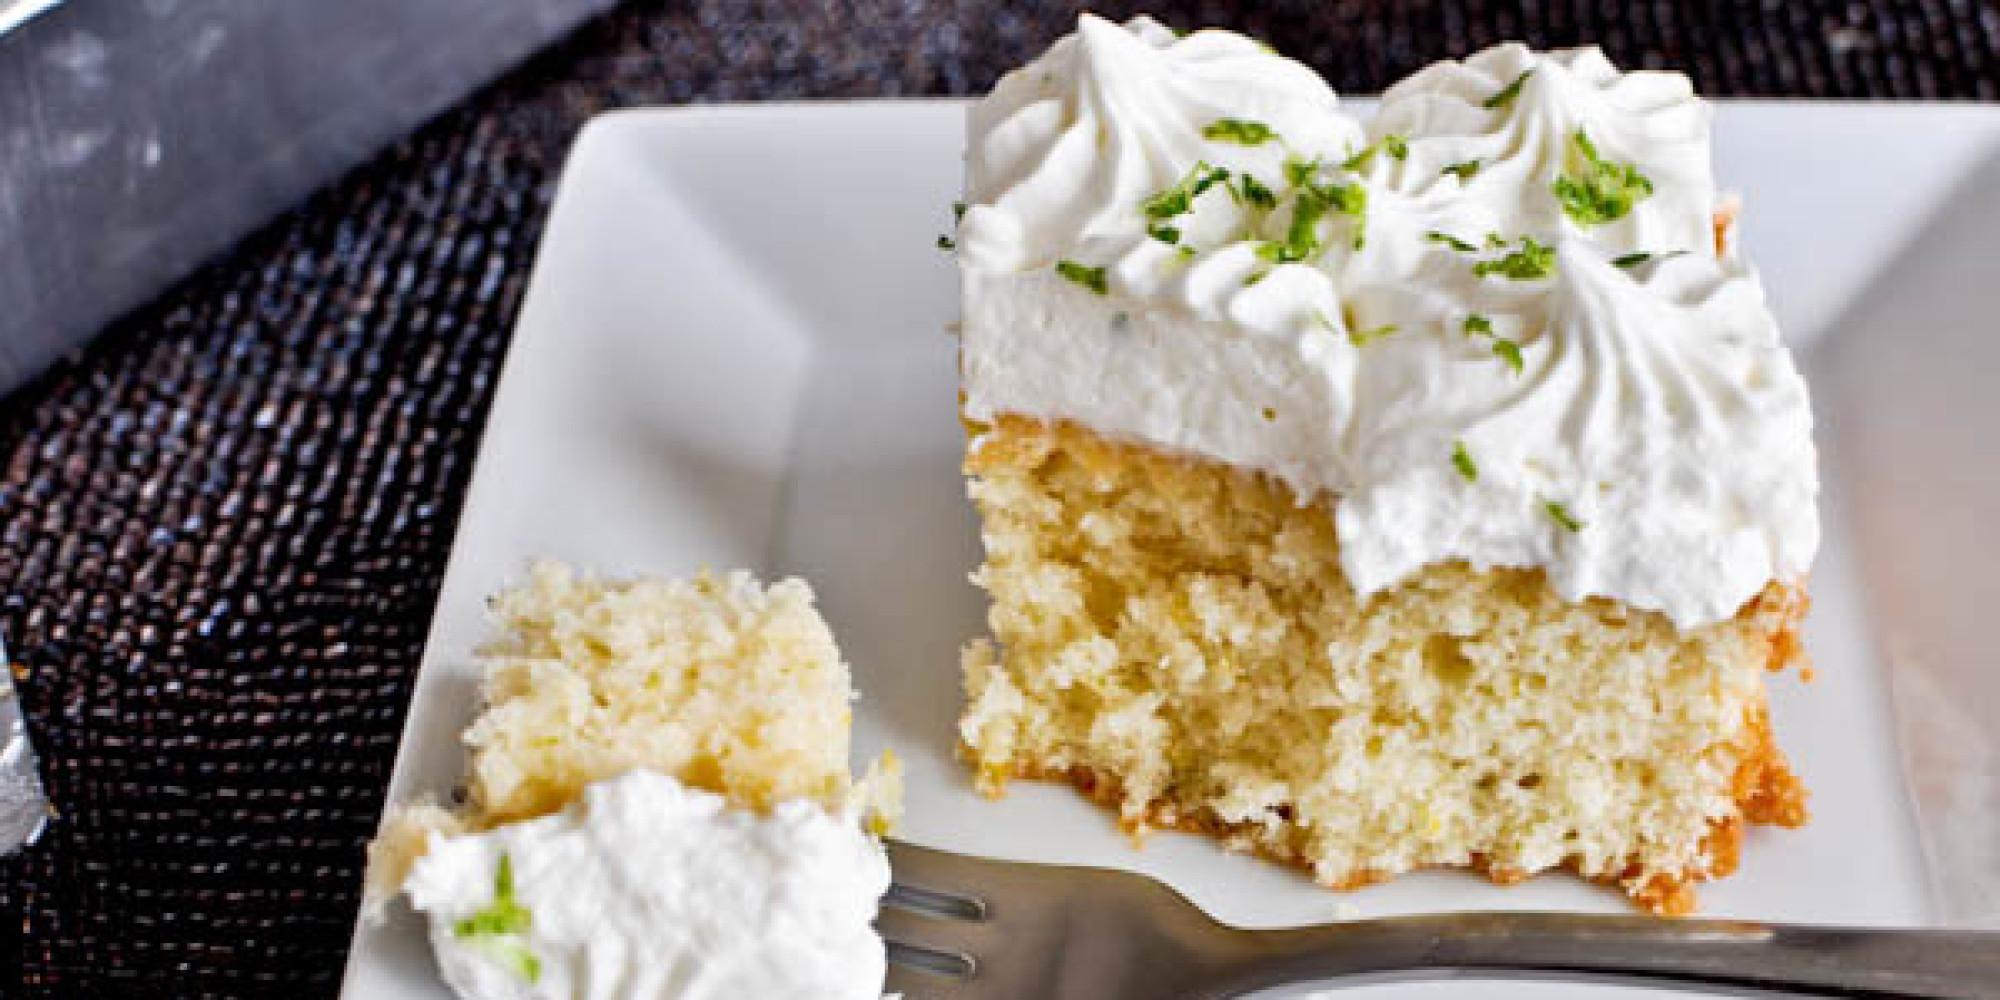 Дизайн тортов со взбитыми сливками фото